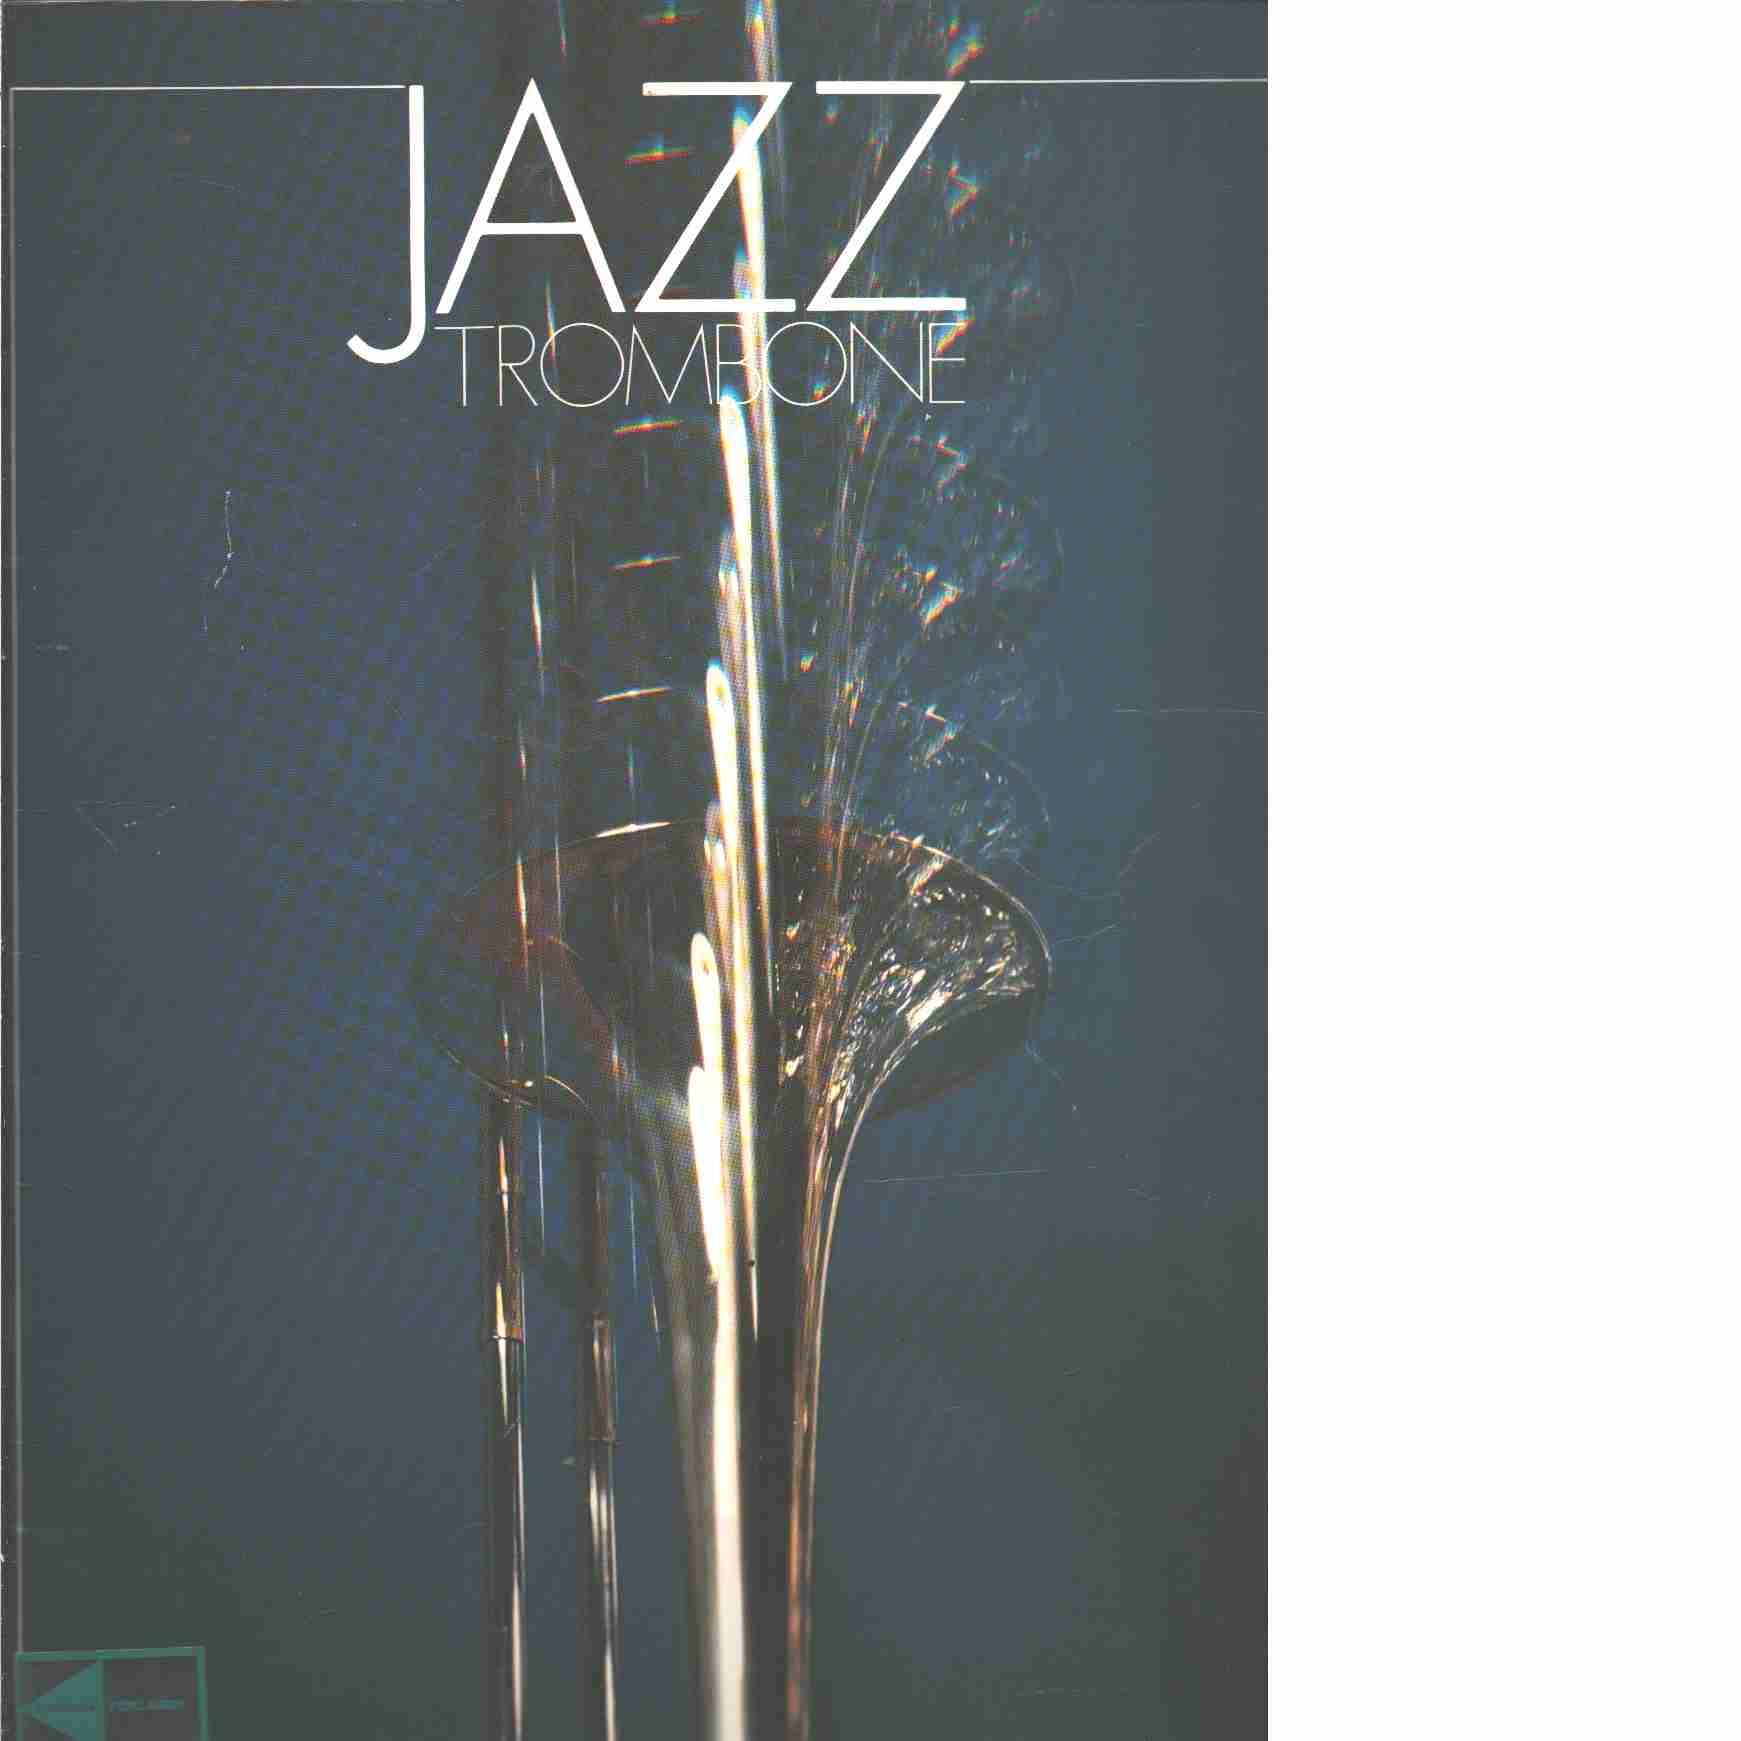 Jazz trombone - Red. Brown, John Robert